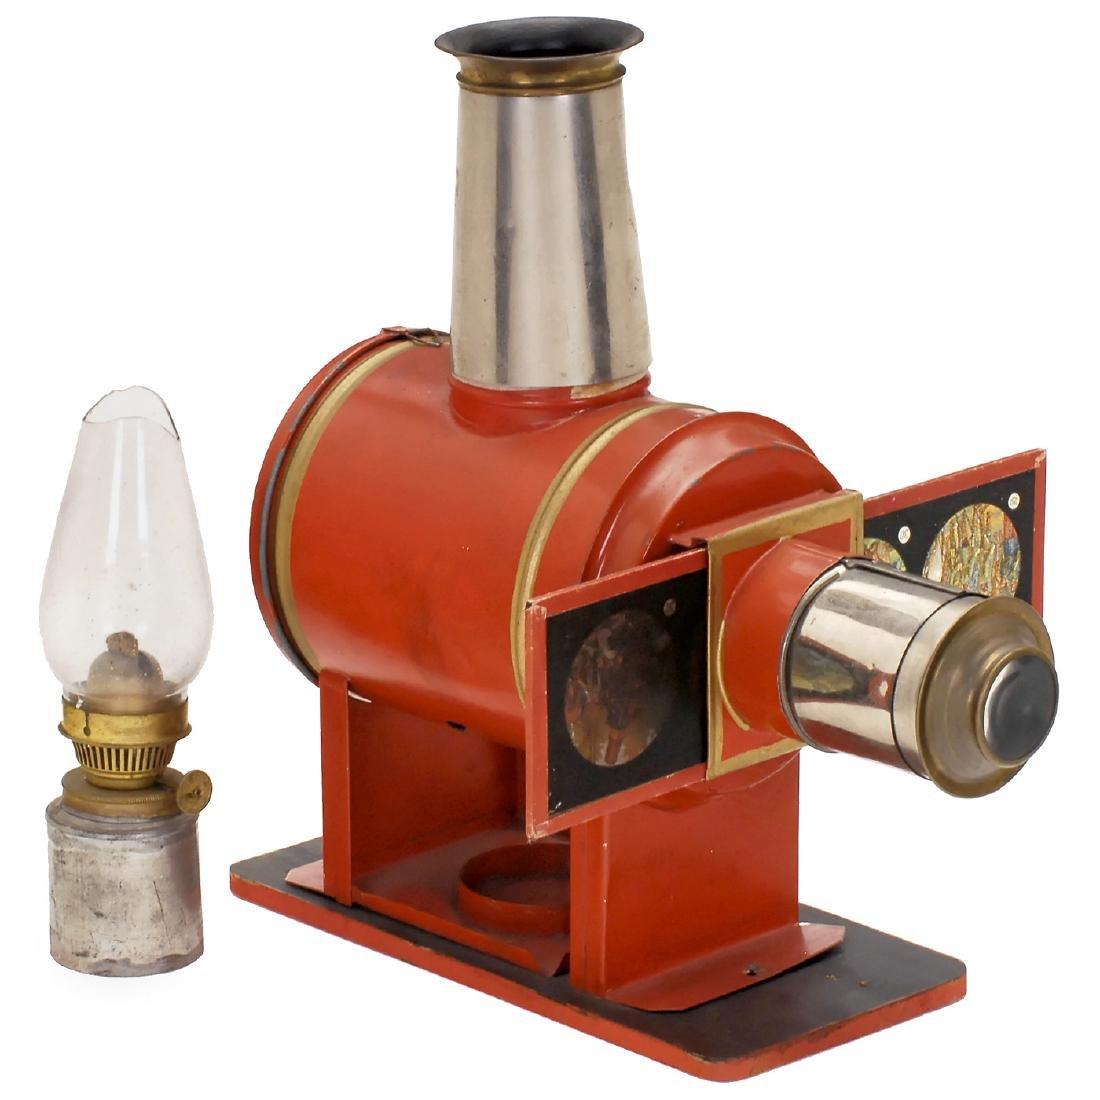 Red Magic Lantern bv E. Plank, c. 1895